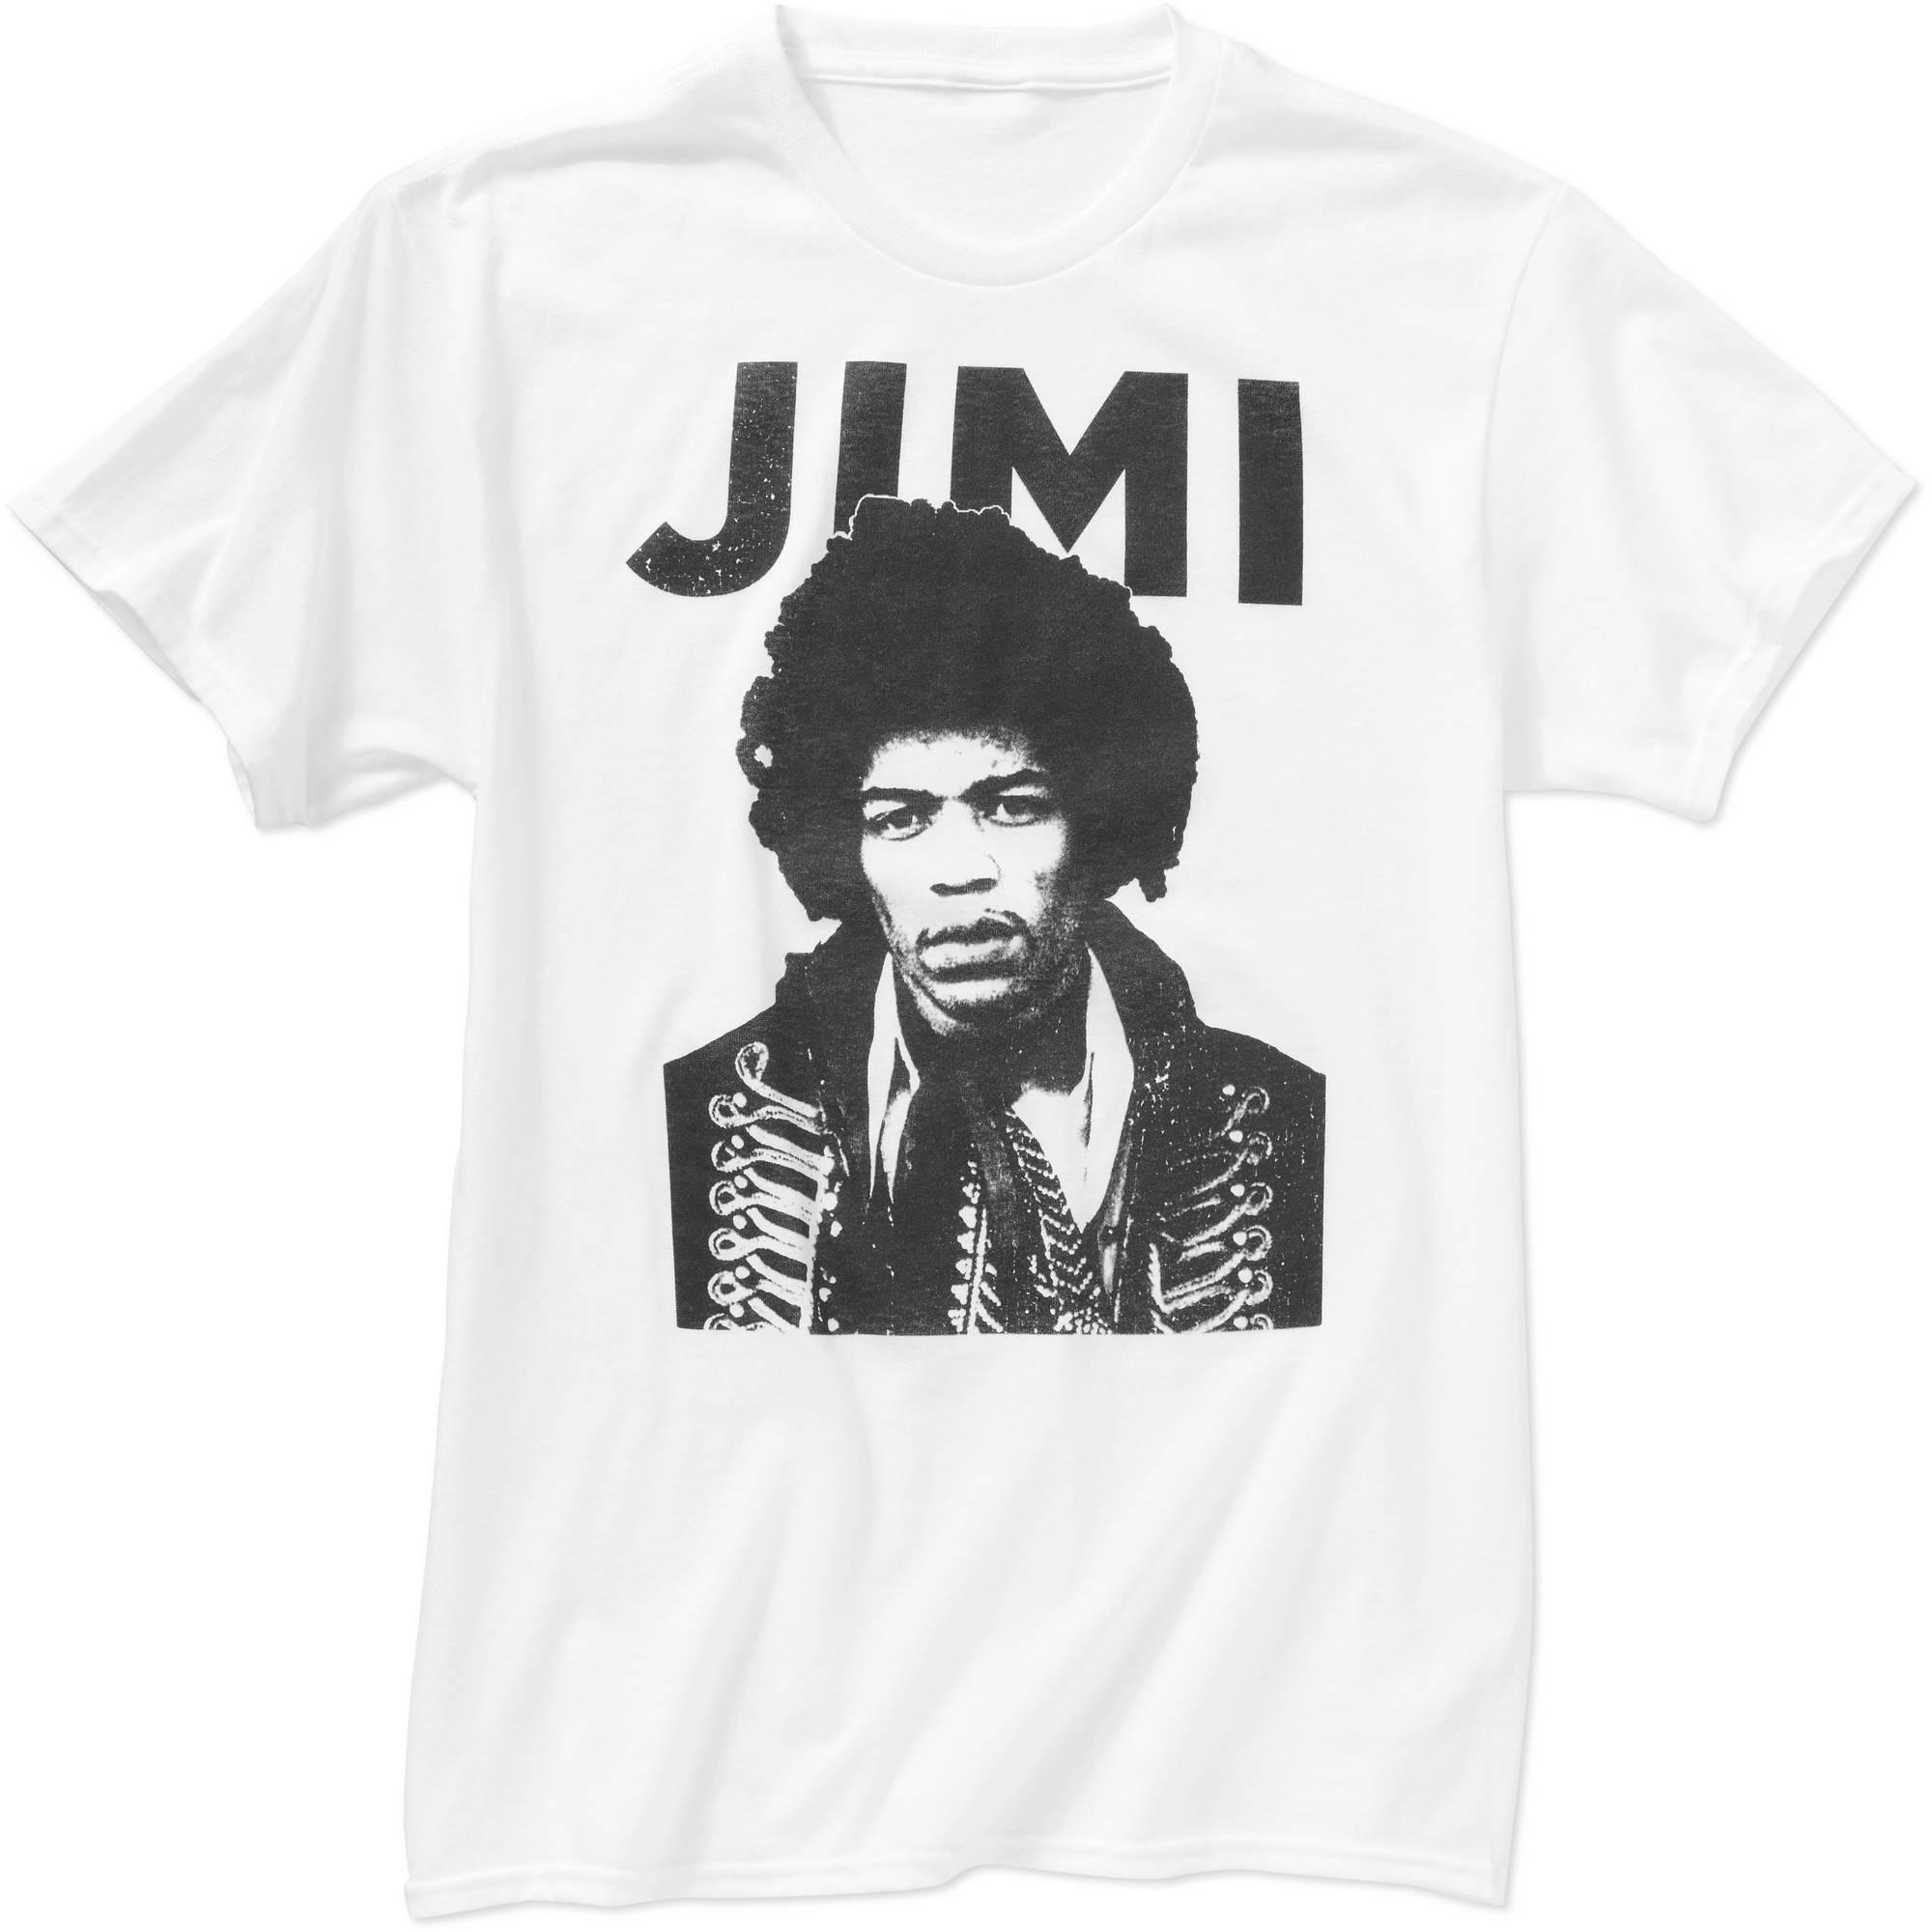 Jimi Hendrix Men's Graphic Tee